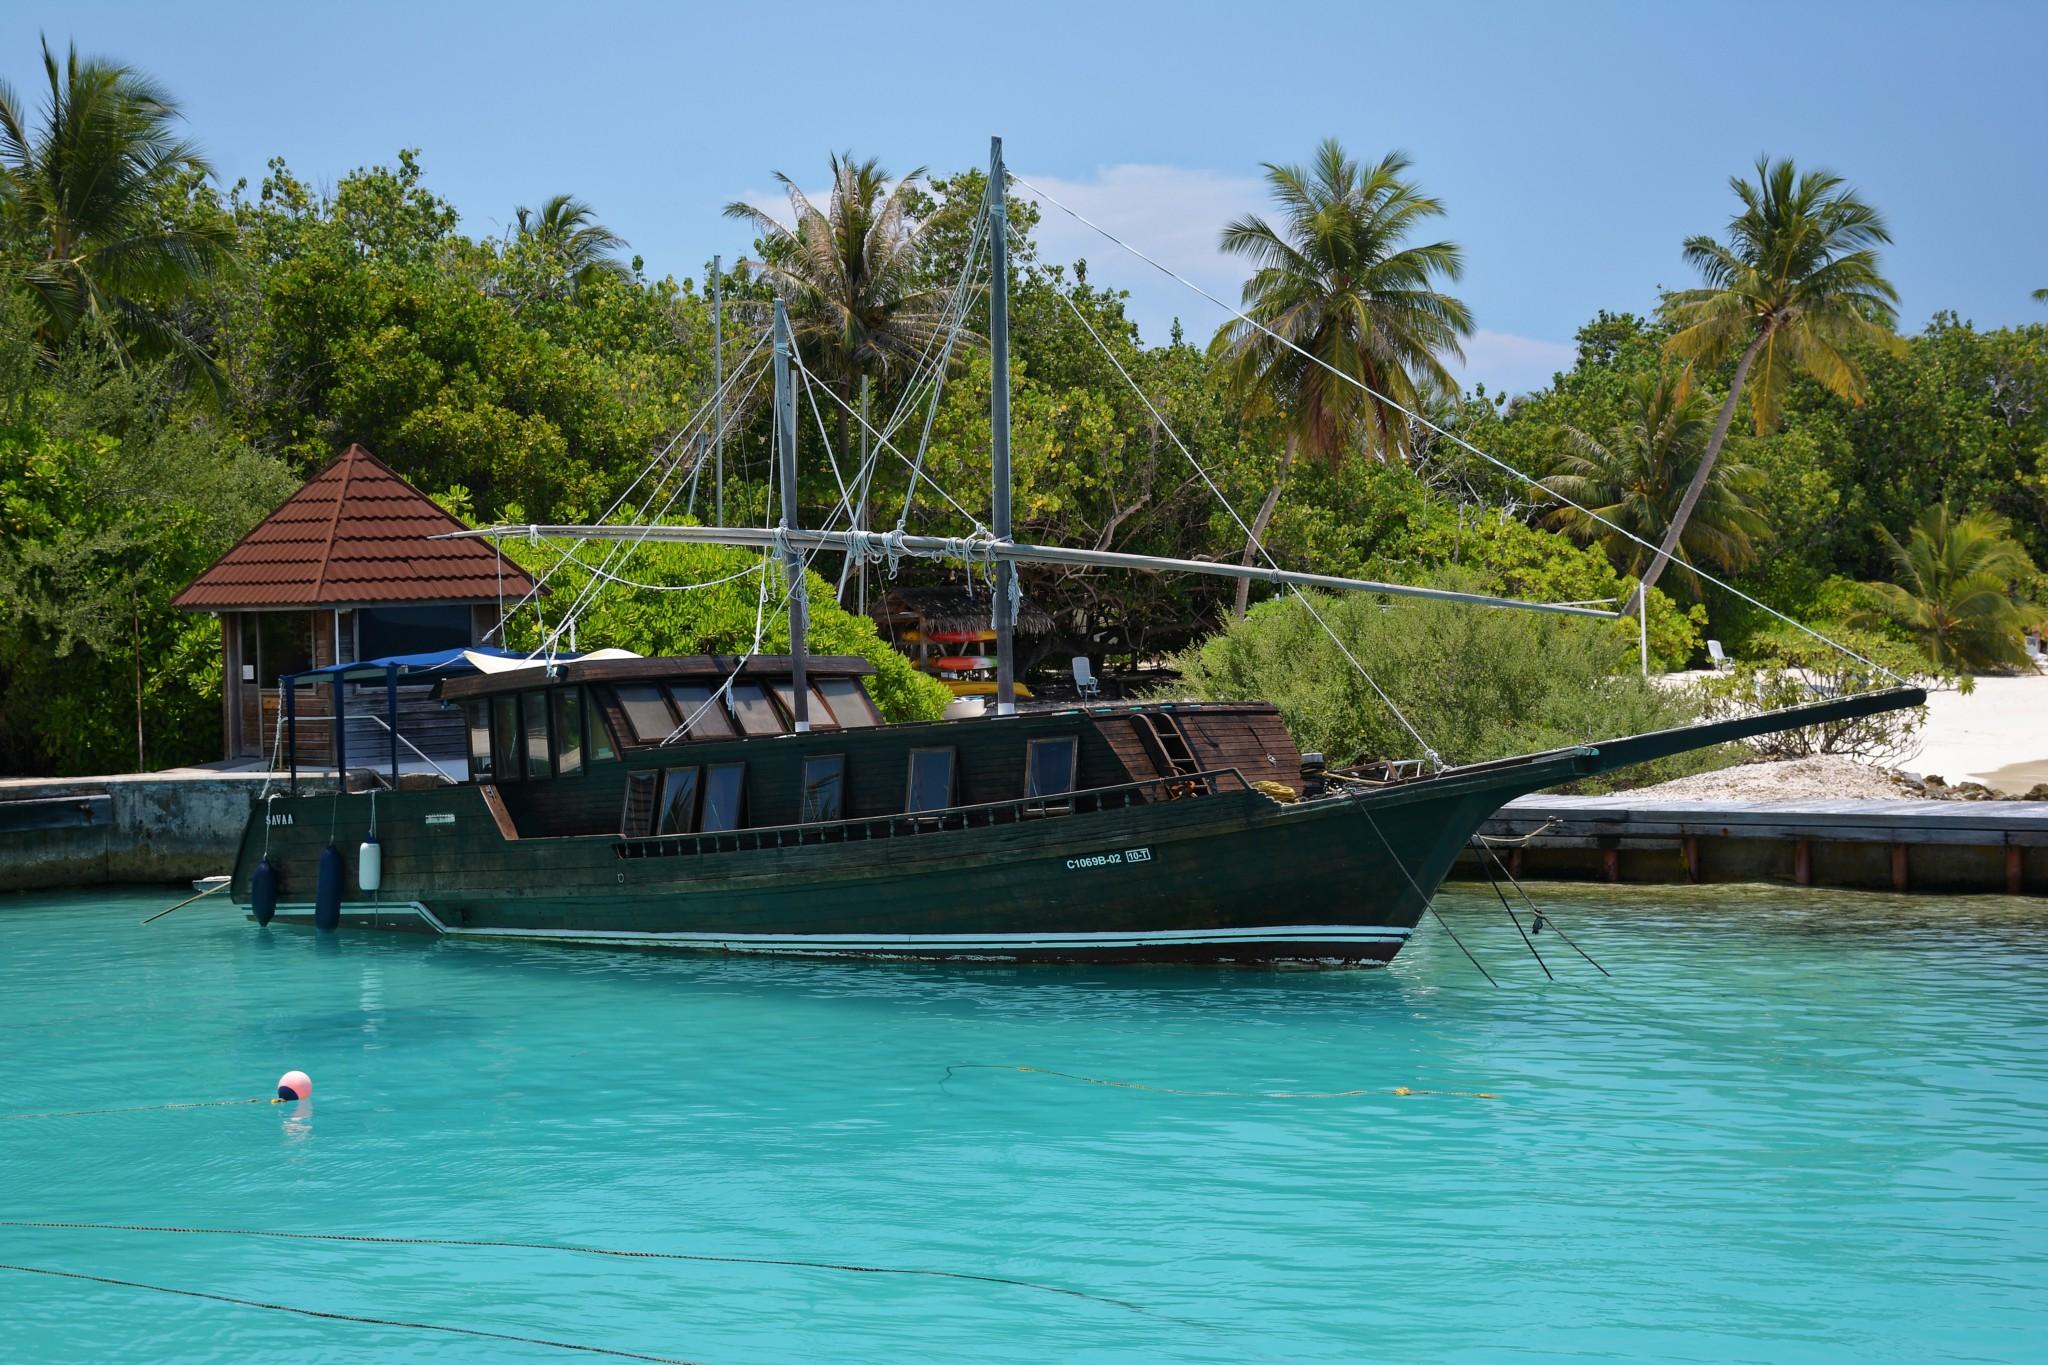 Ausflugsboot - Insel Bandos